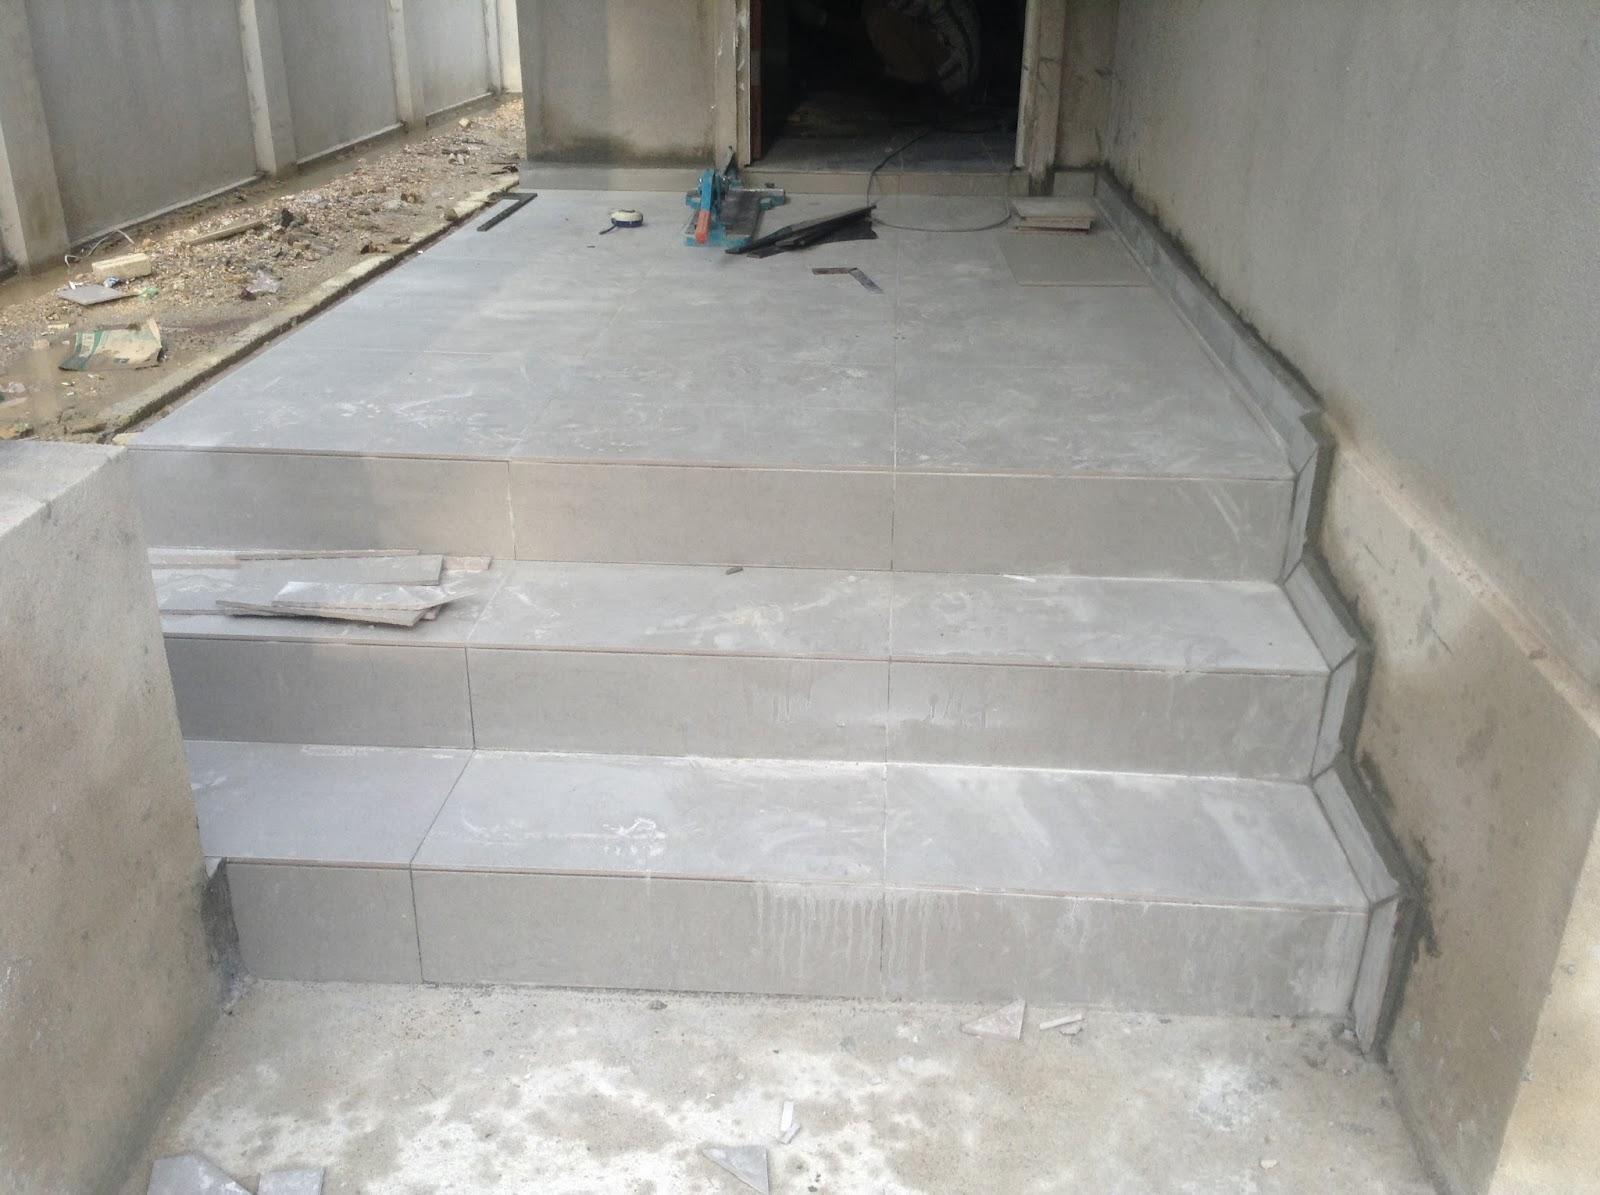 Beranda Belakang Rumah Menggunakan Tiles 2 X1